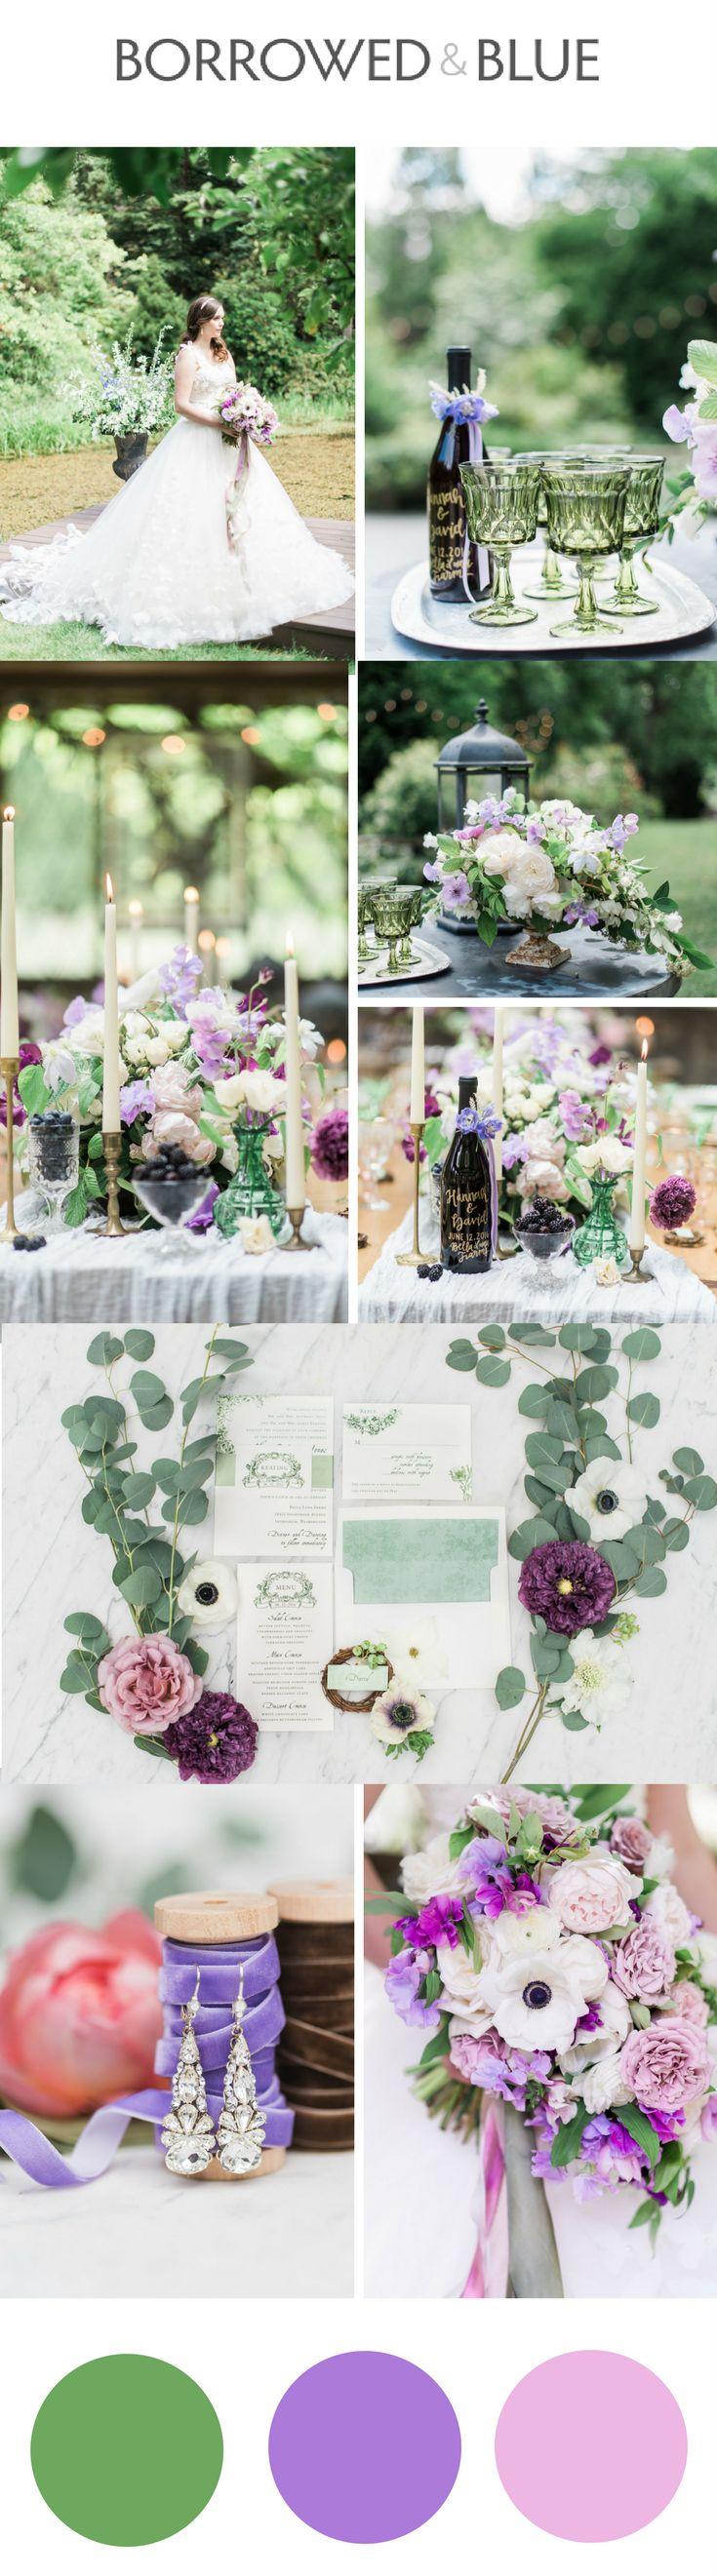 41 best wedding palettes color schemes images on pinterest